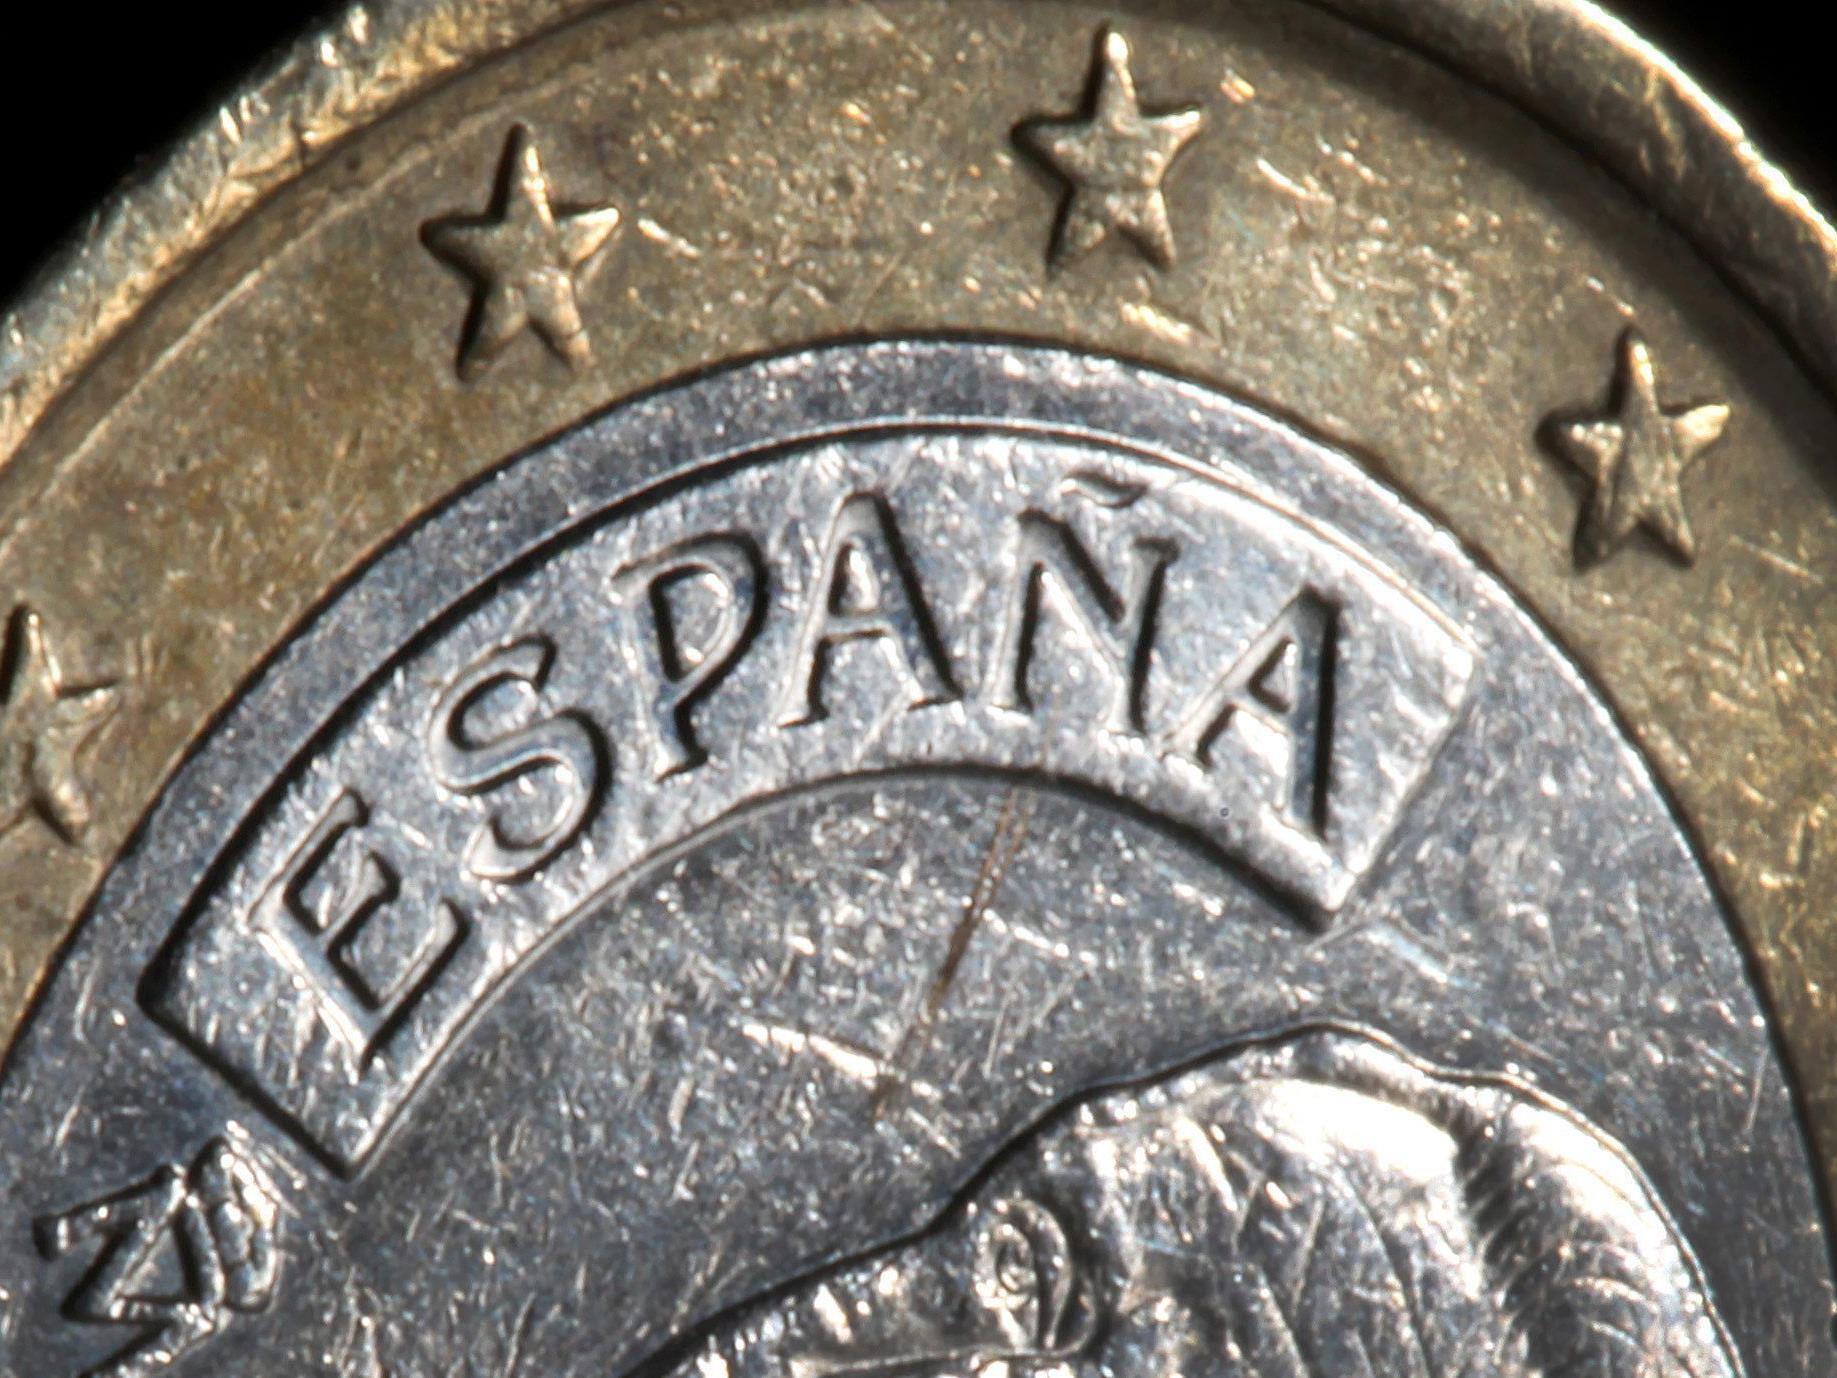 Neue EU-Welt: Griechenland muss sparen, Spanien nicht.